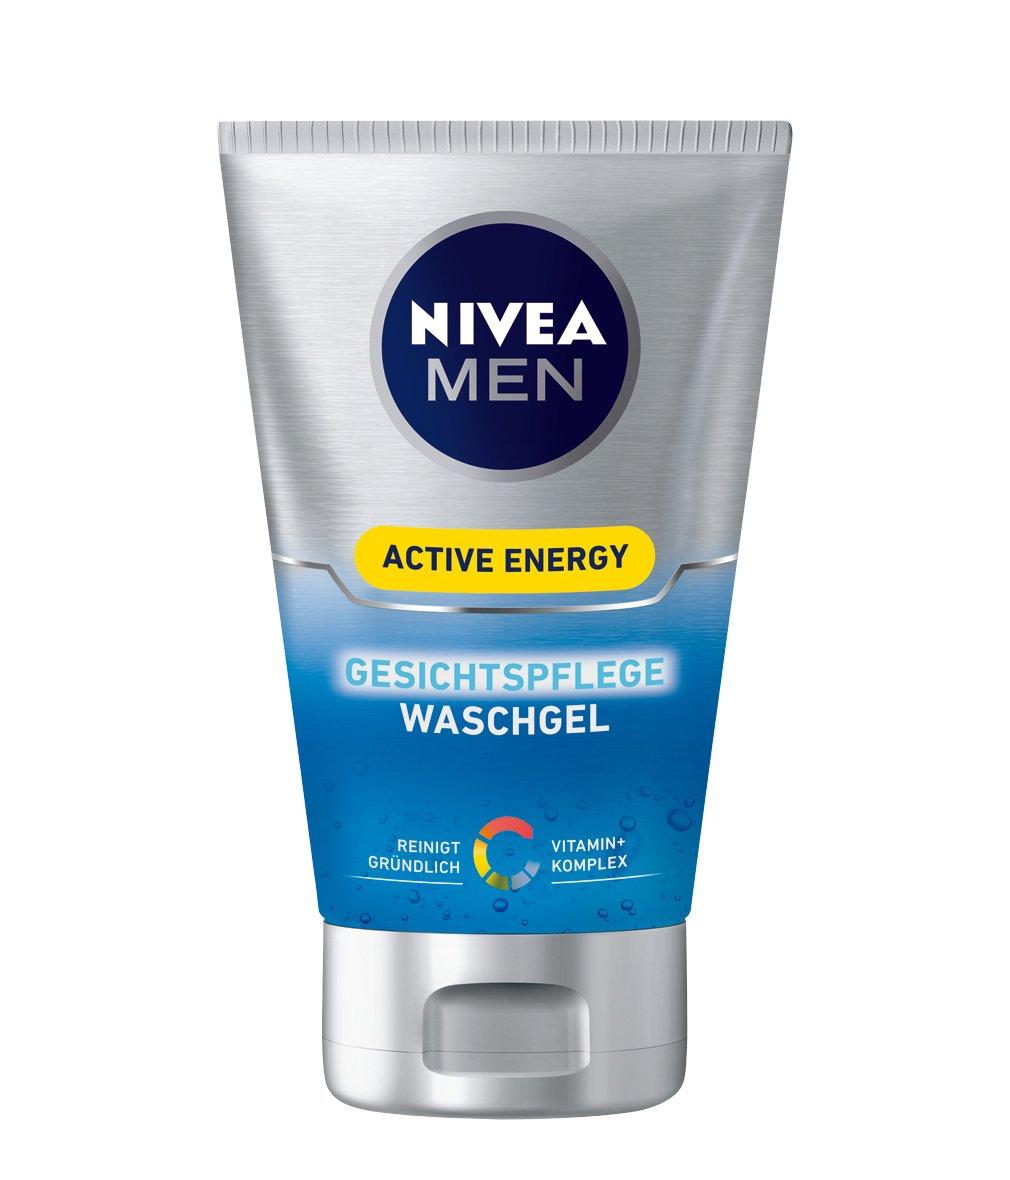 Nivea Men Active Energy Gesichtspflege Waschgel, 2er Pack (2 x 100 ml) 88885_1